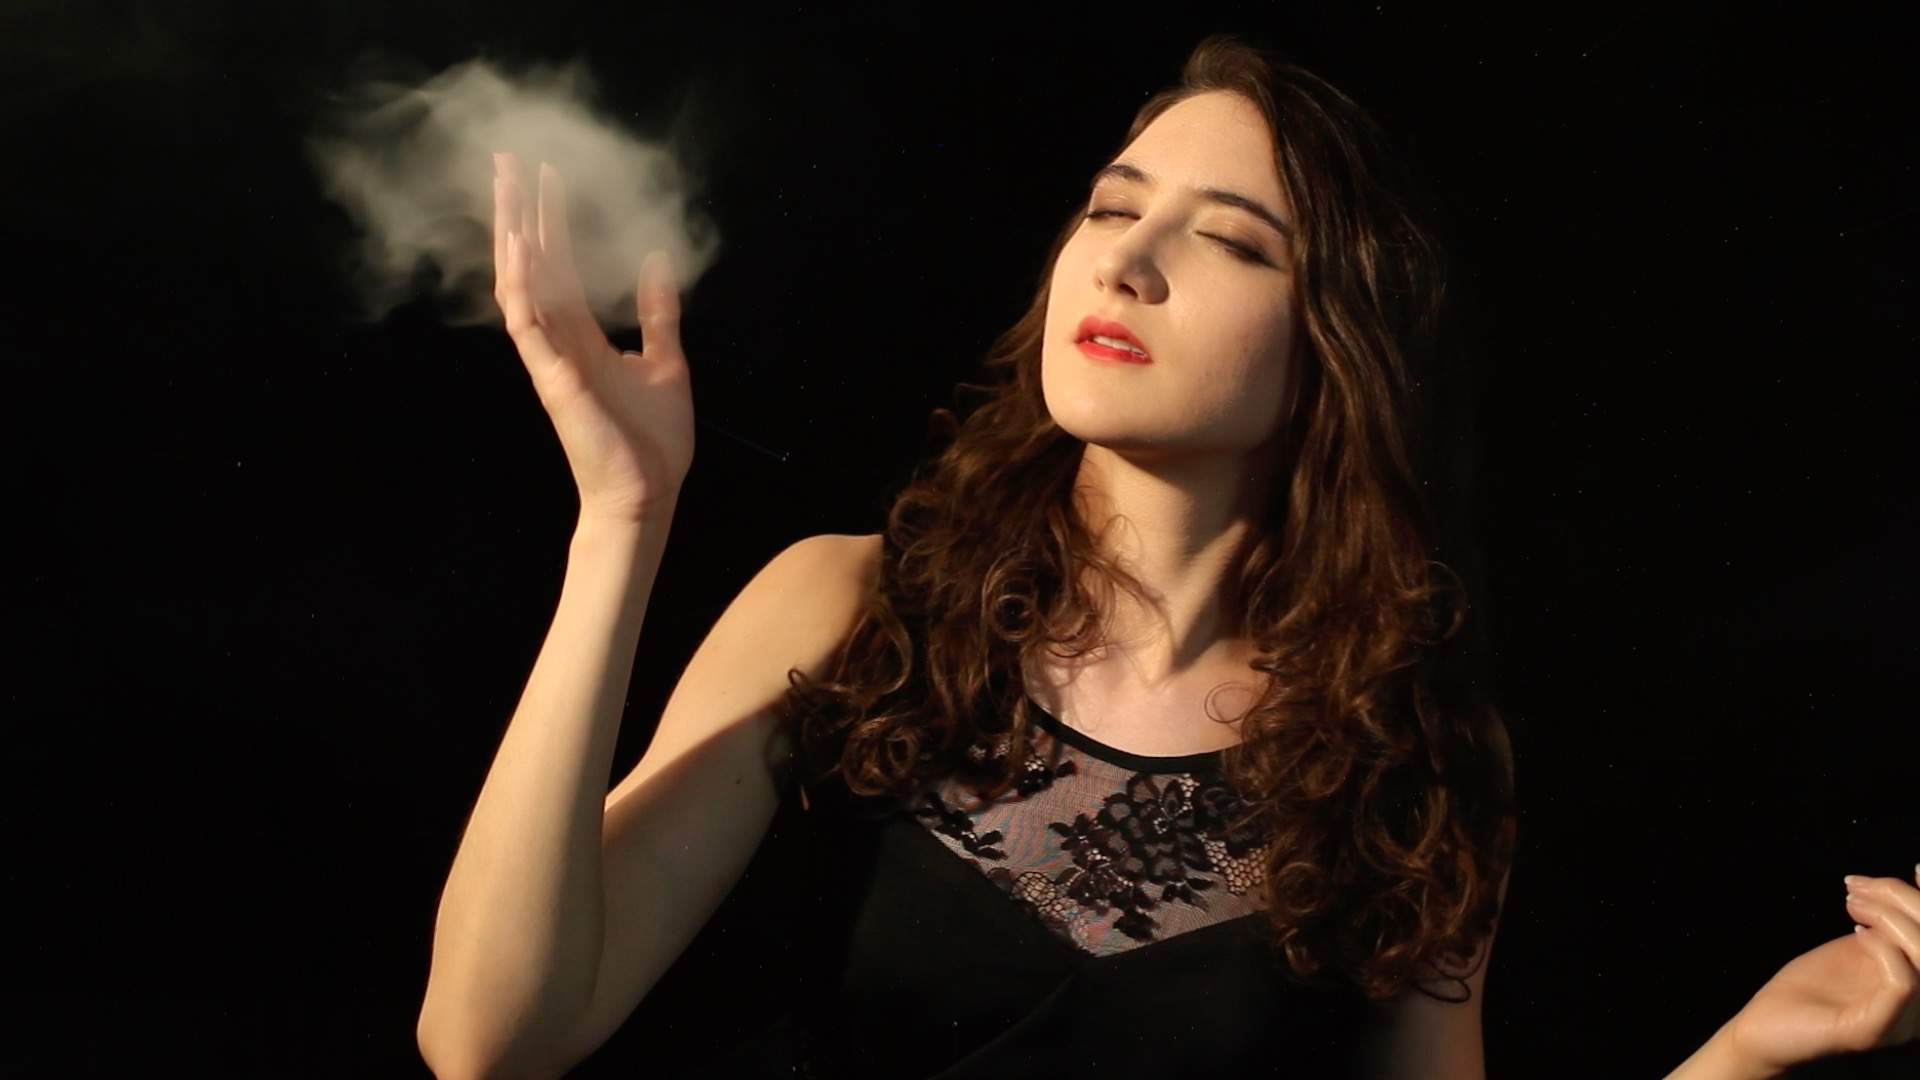 clip – Juste en rêvant – Manon Novak -viviane -riberaigua -realisateur3 music video director